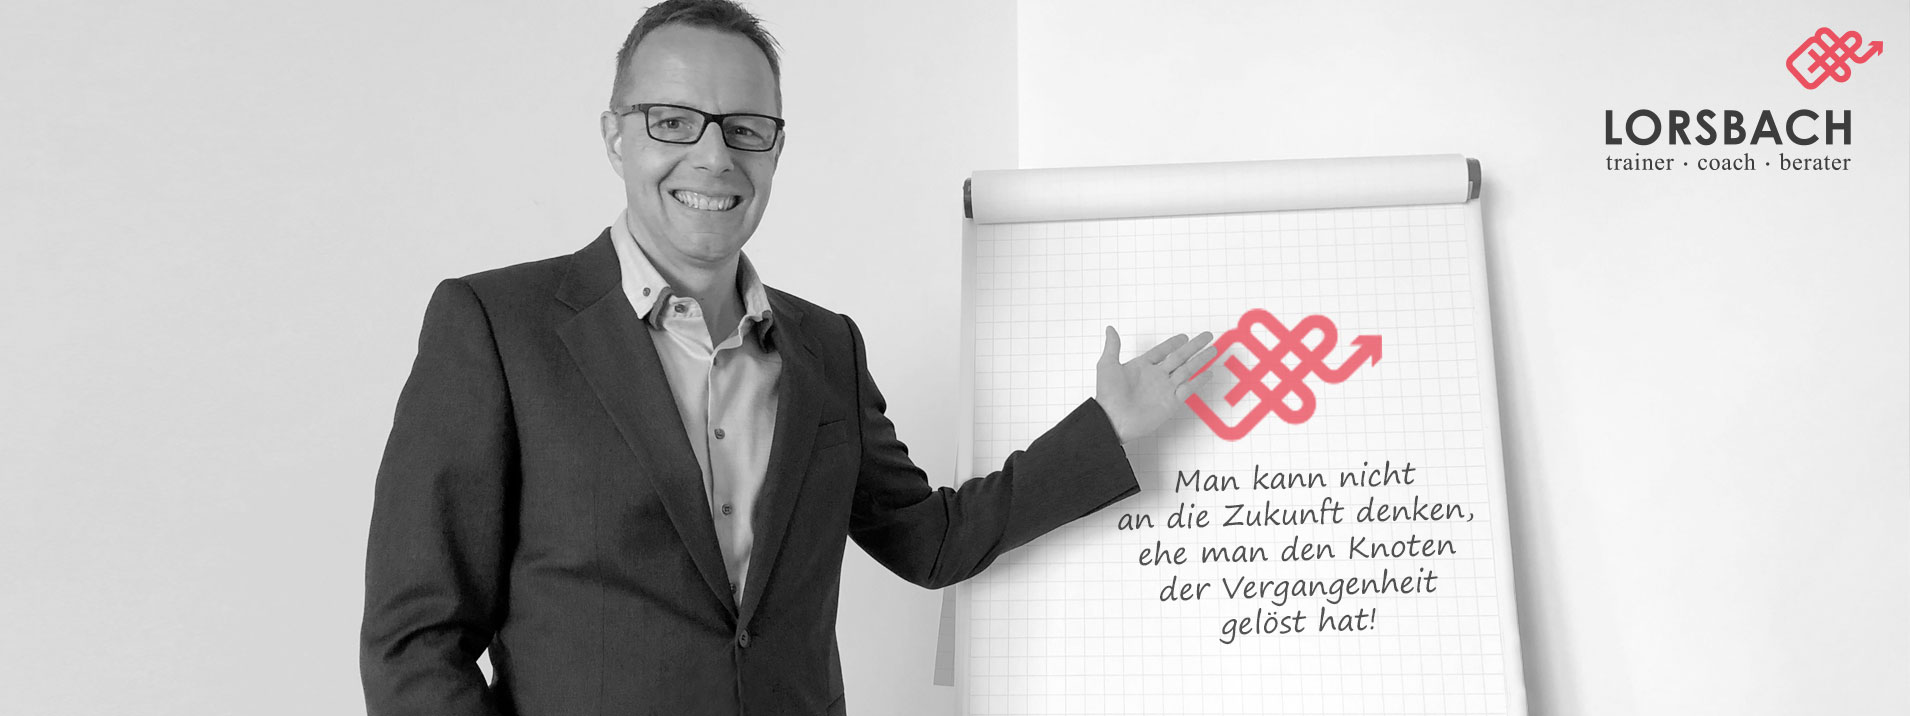 Lars Lorsbach Coach